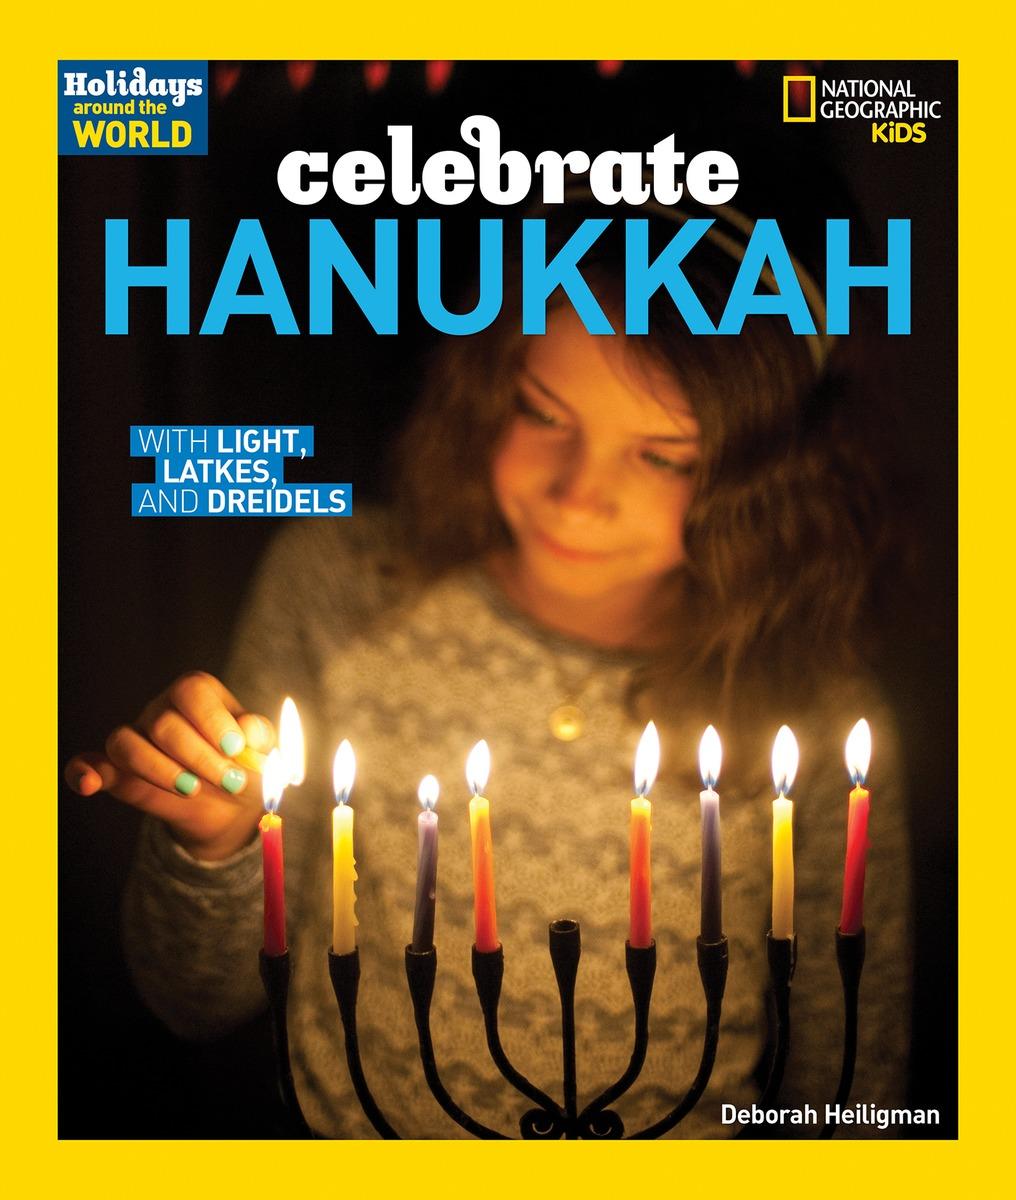 Holidays Around the World: Celebrate Hanukkah travels of the zephyr journey around the world